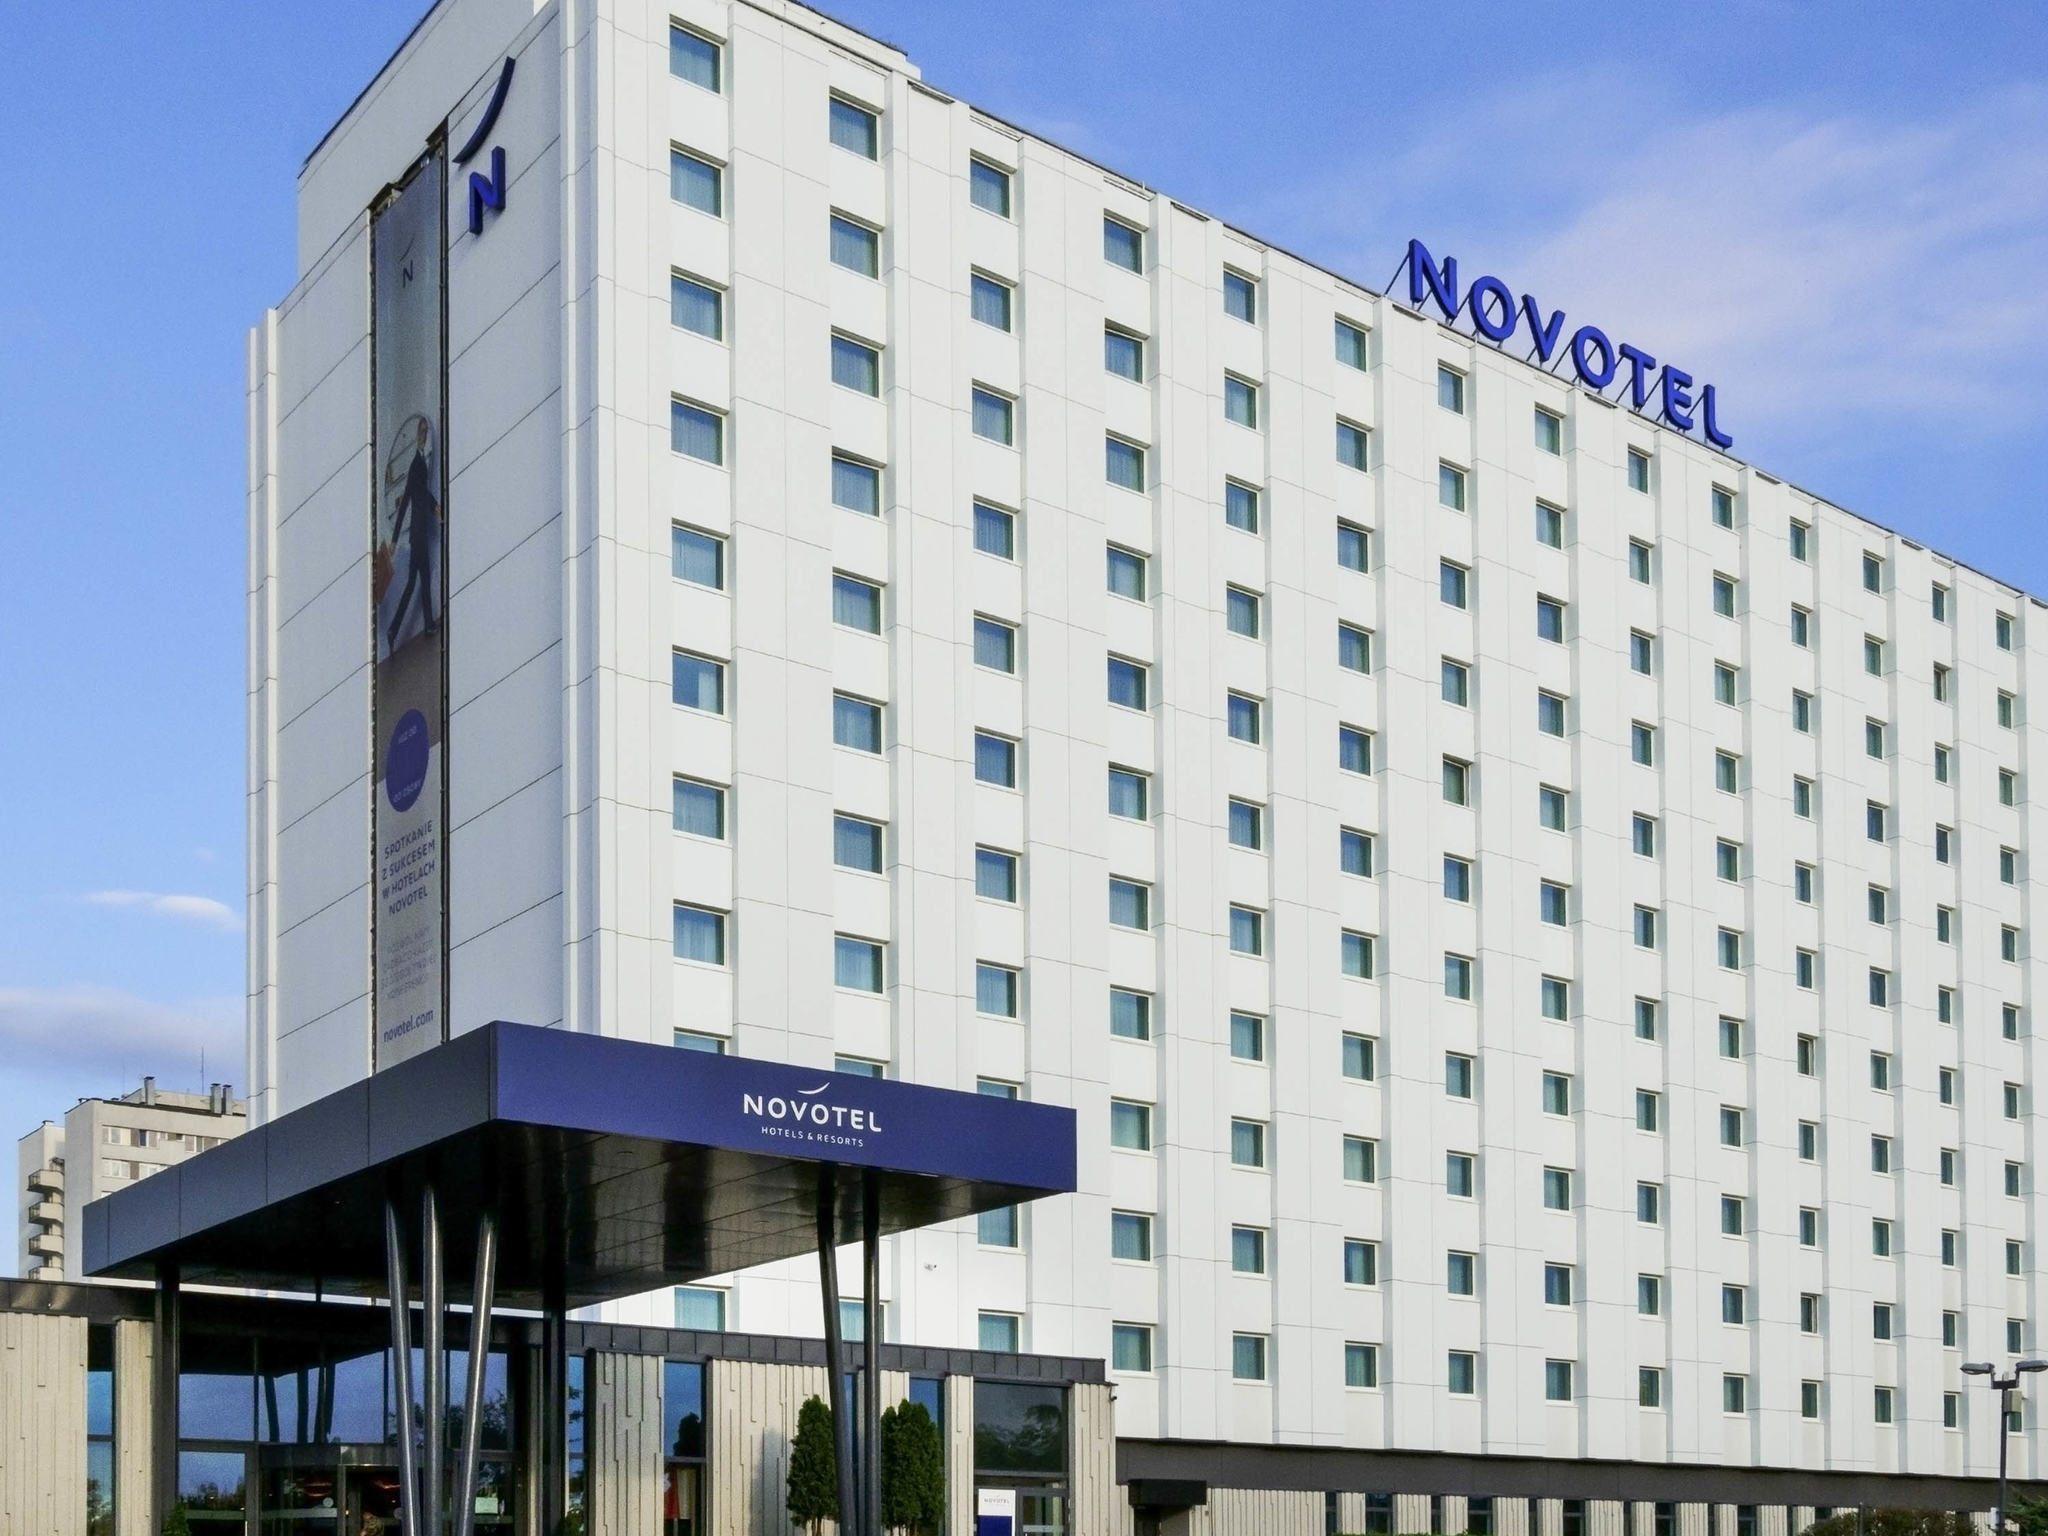 Lit Rond Bebe Belle Hotel Novotel Krakow City West